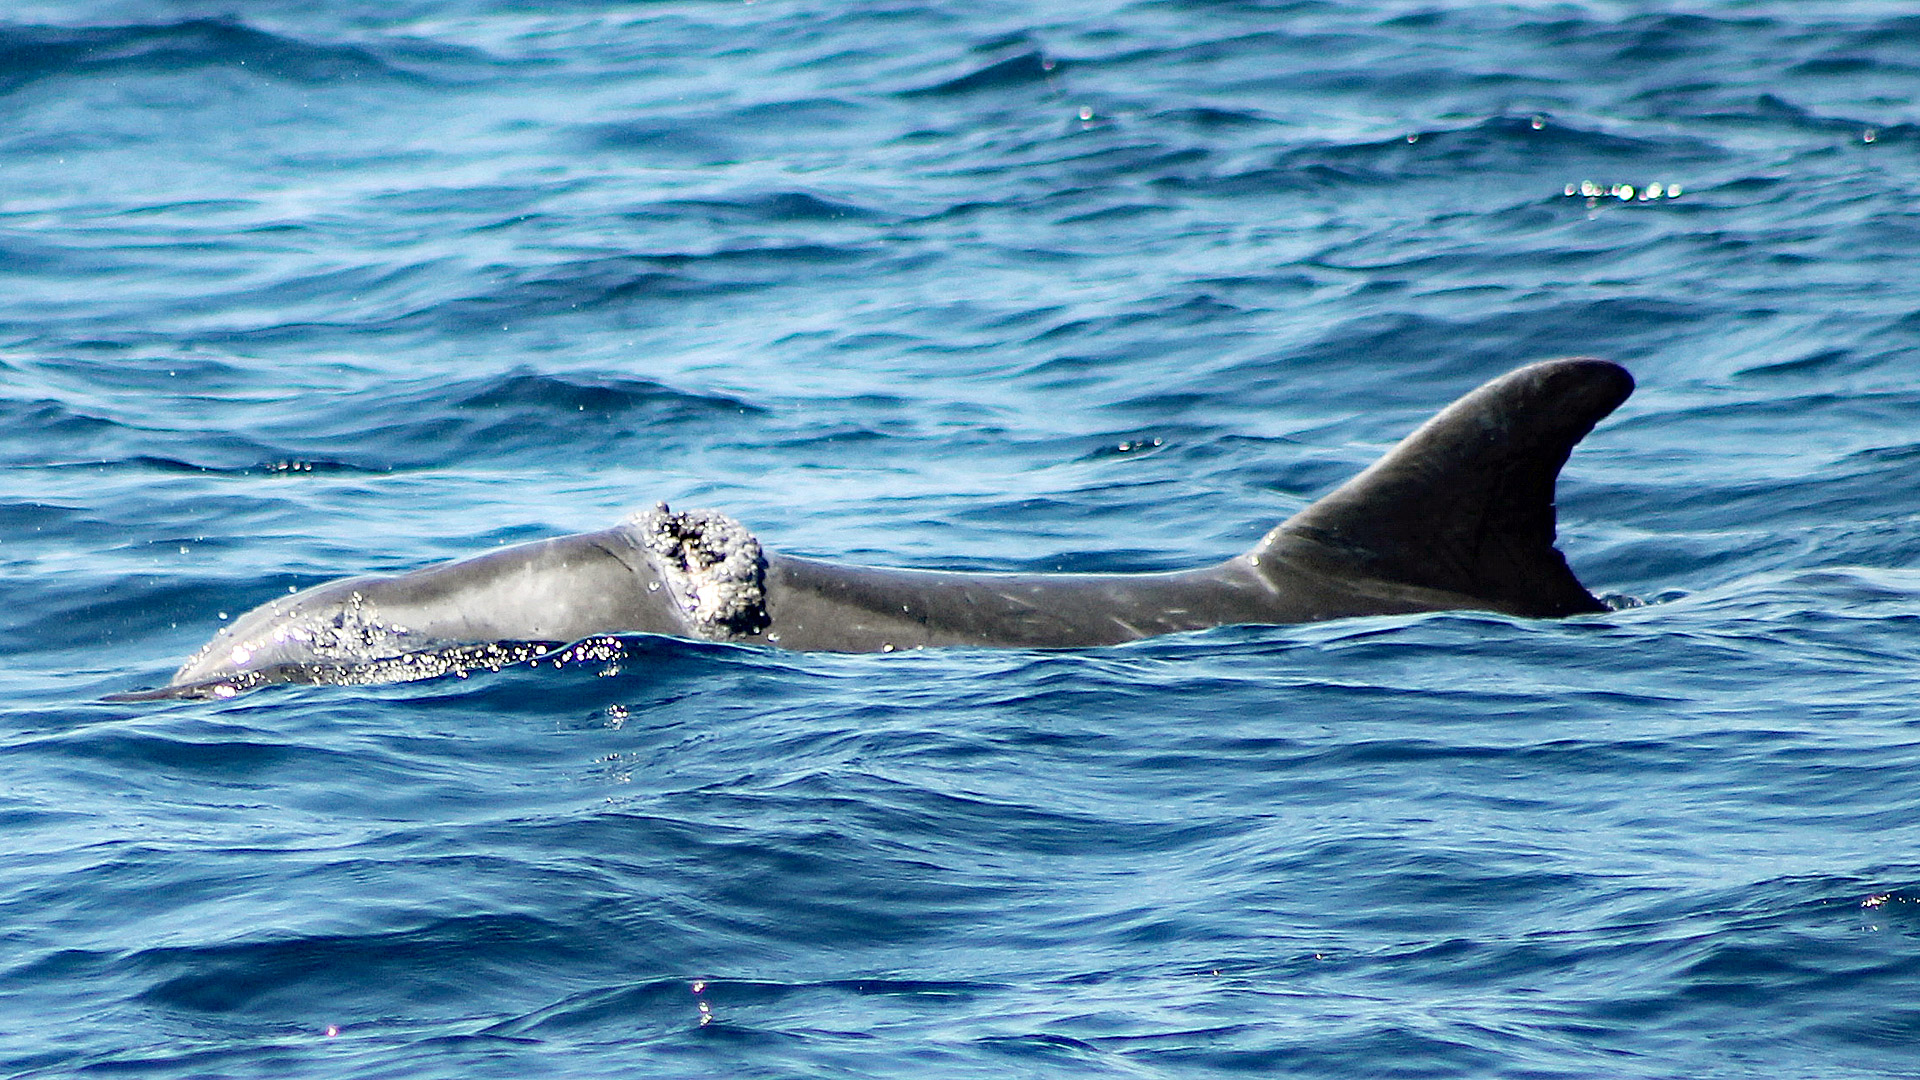 Der verletzte Delfin Kosara 2016 vor Zirje.